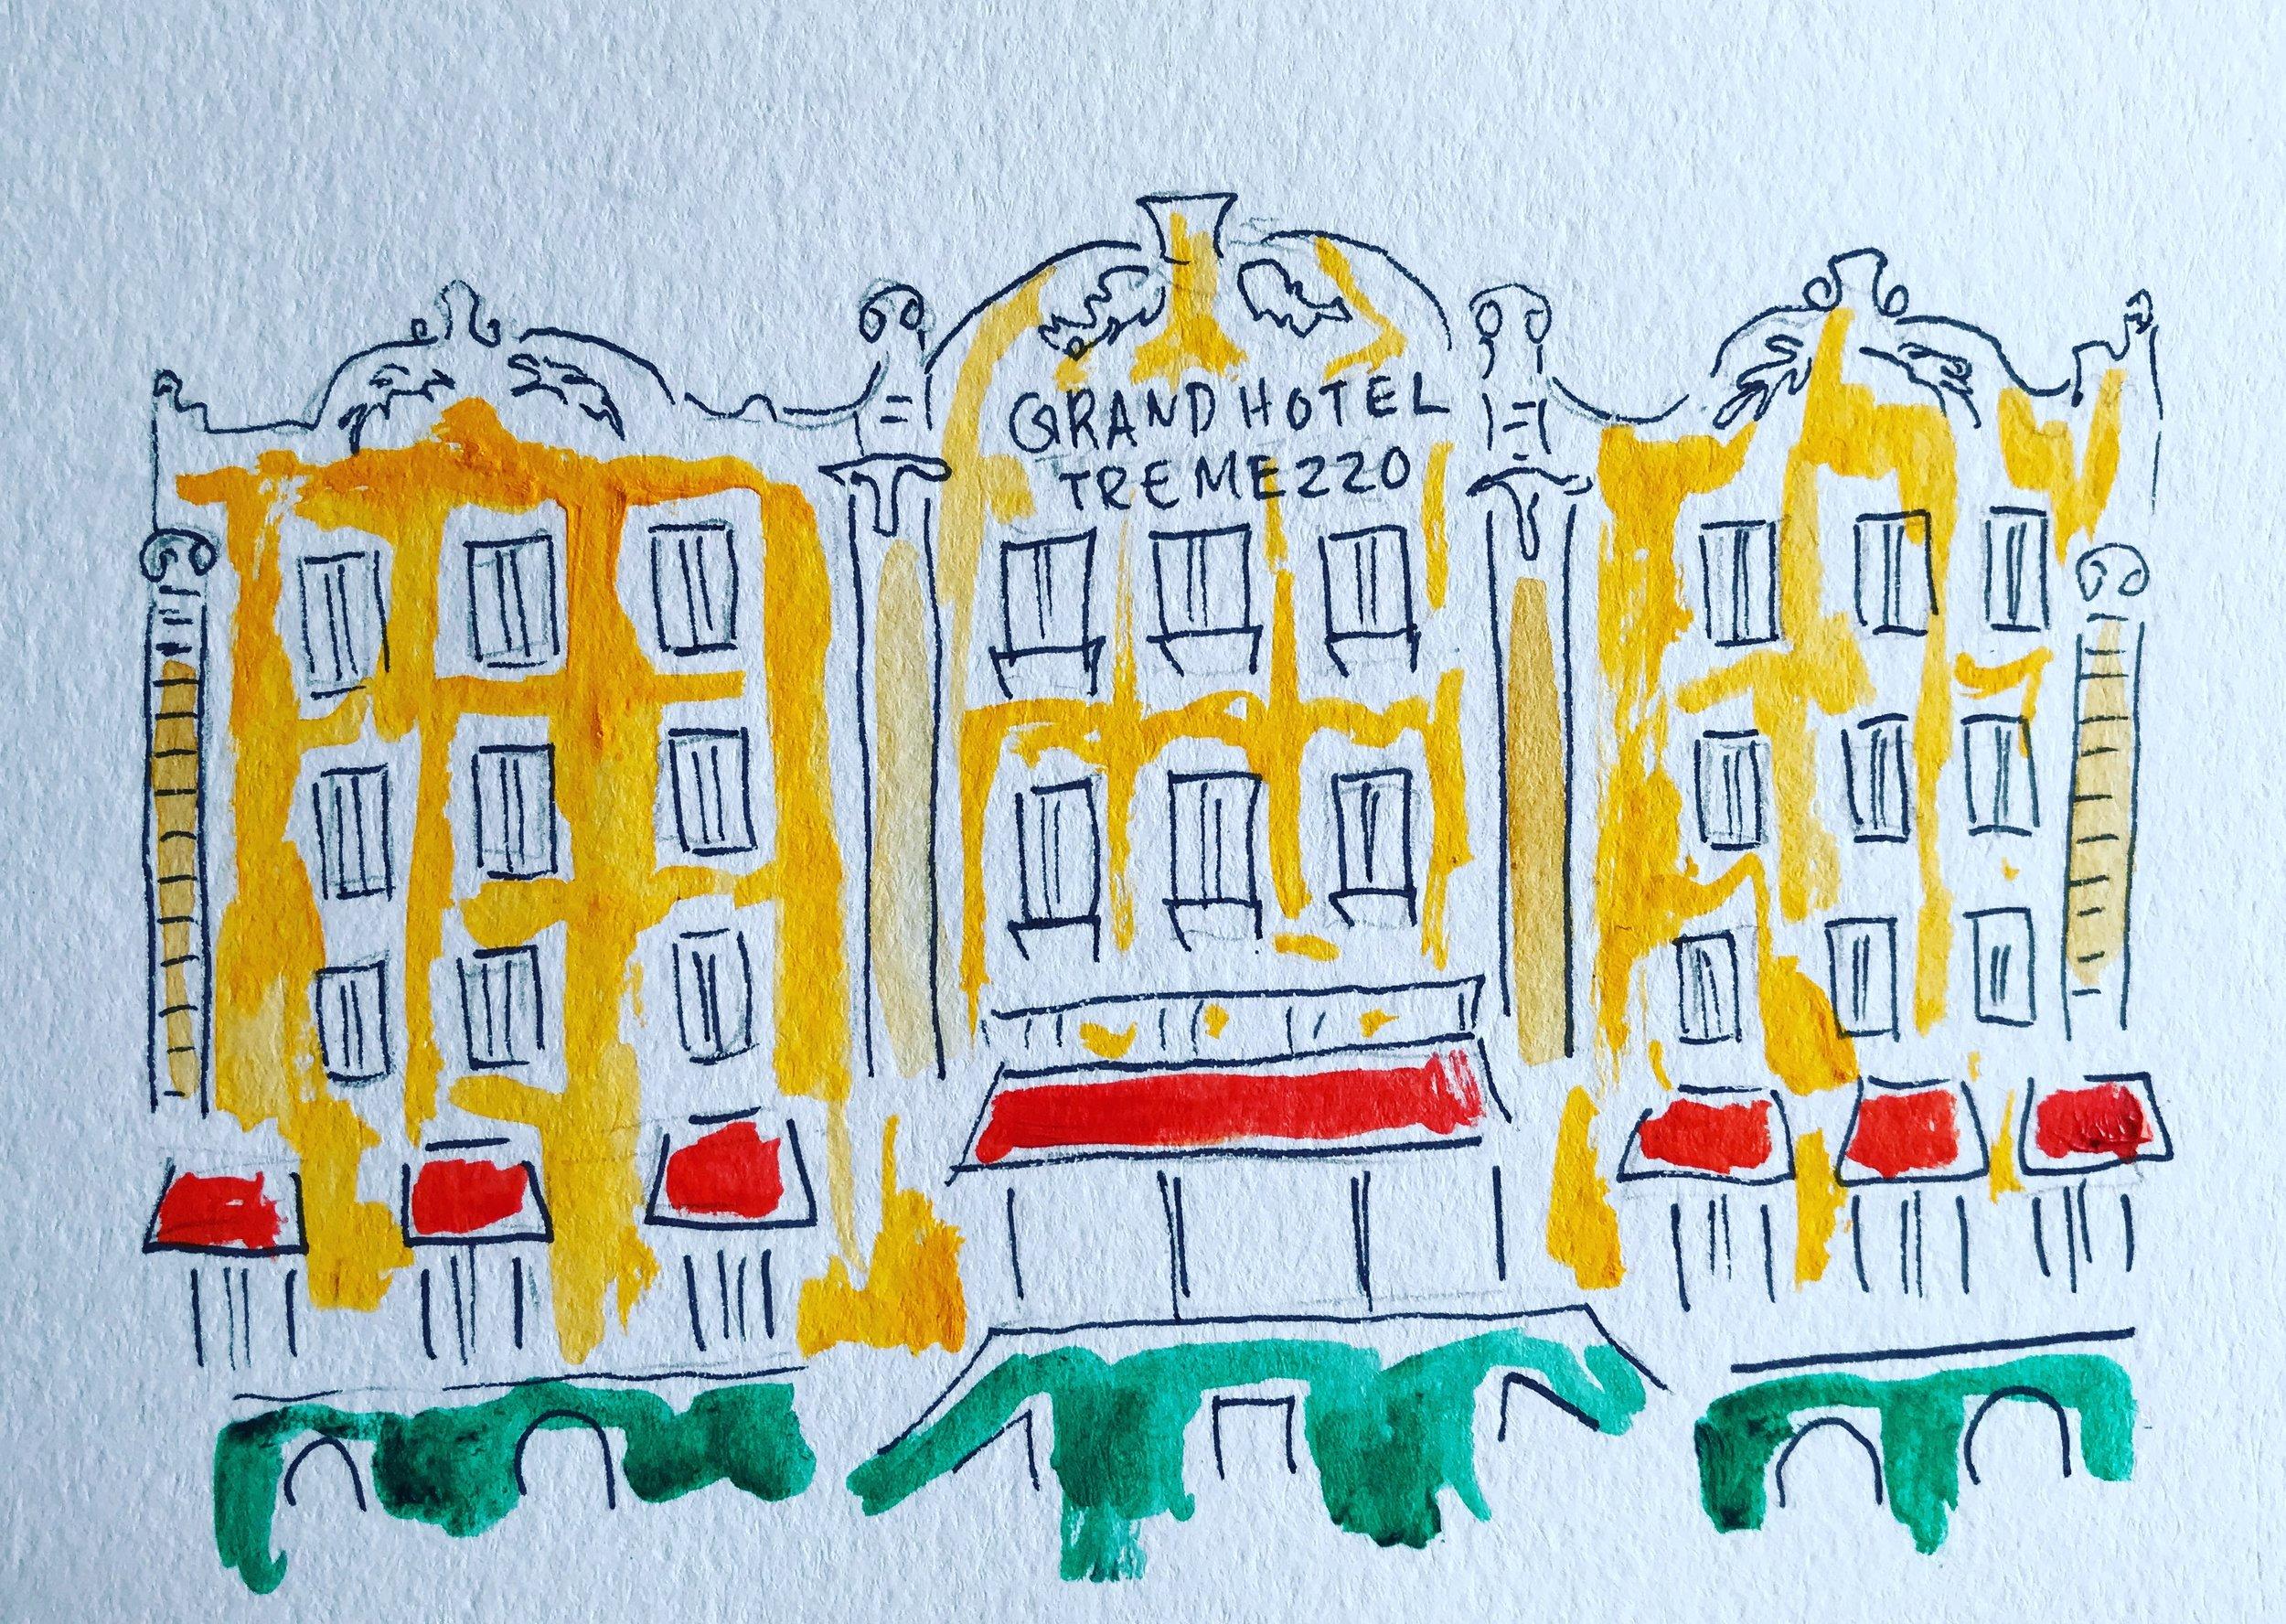 Grand Hotel Tremezzo Italy